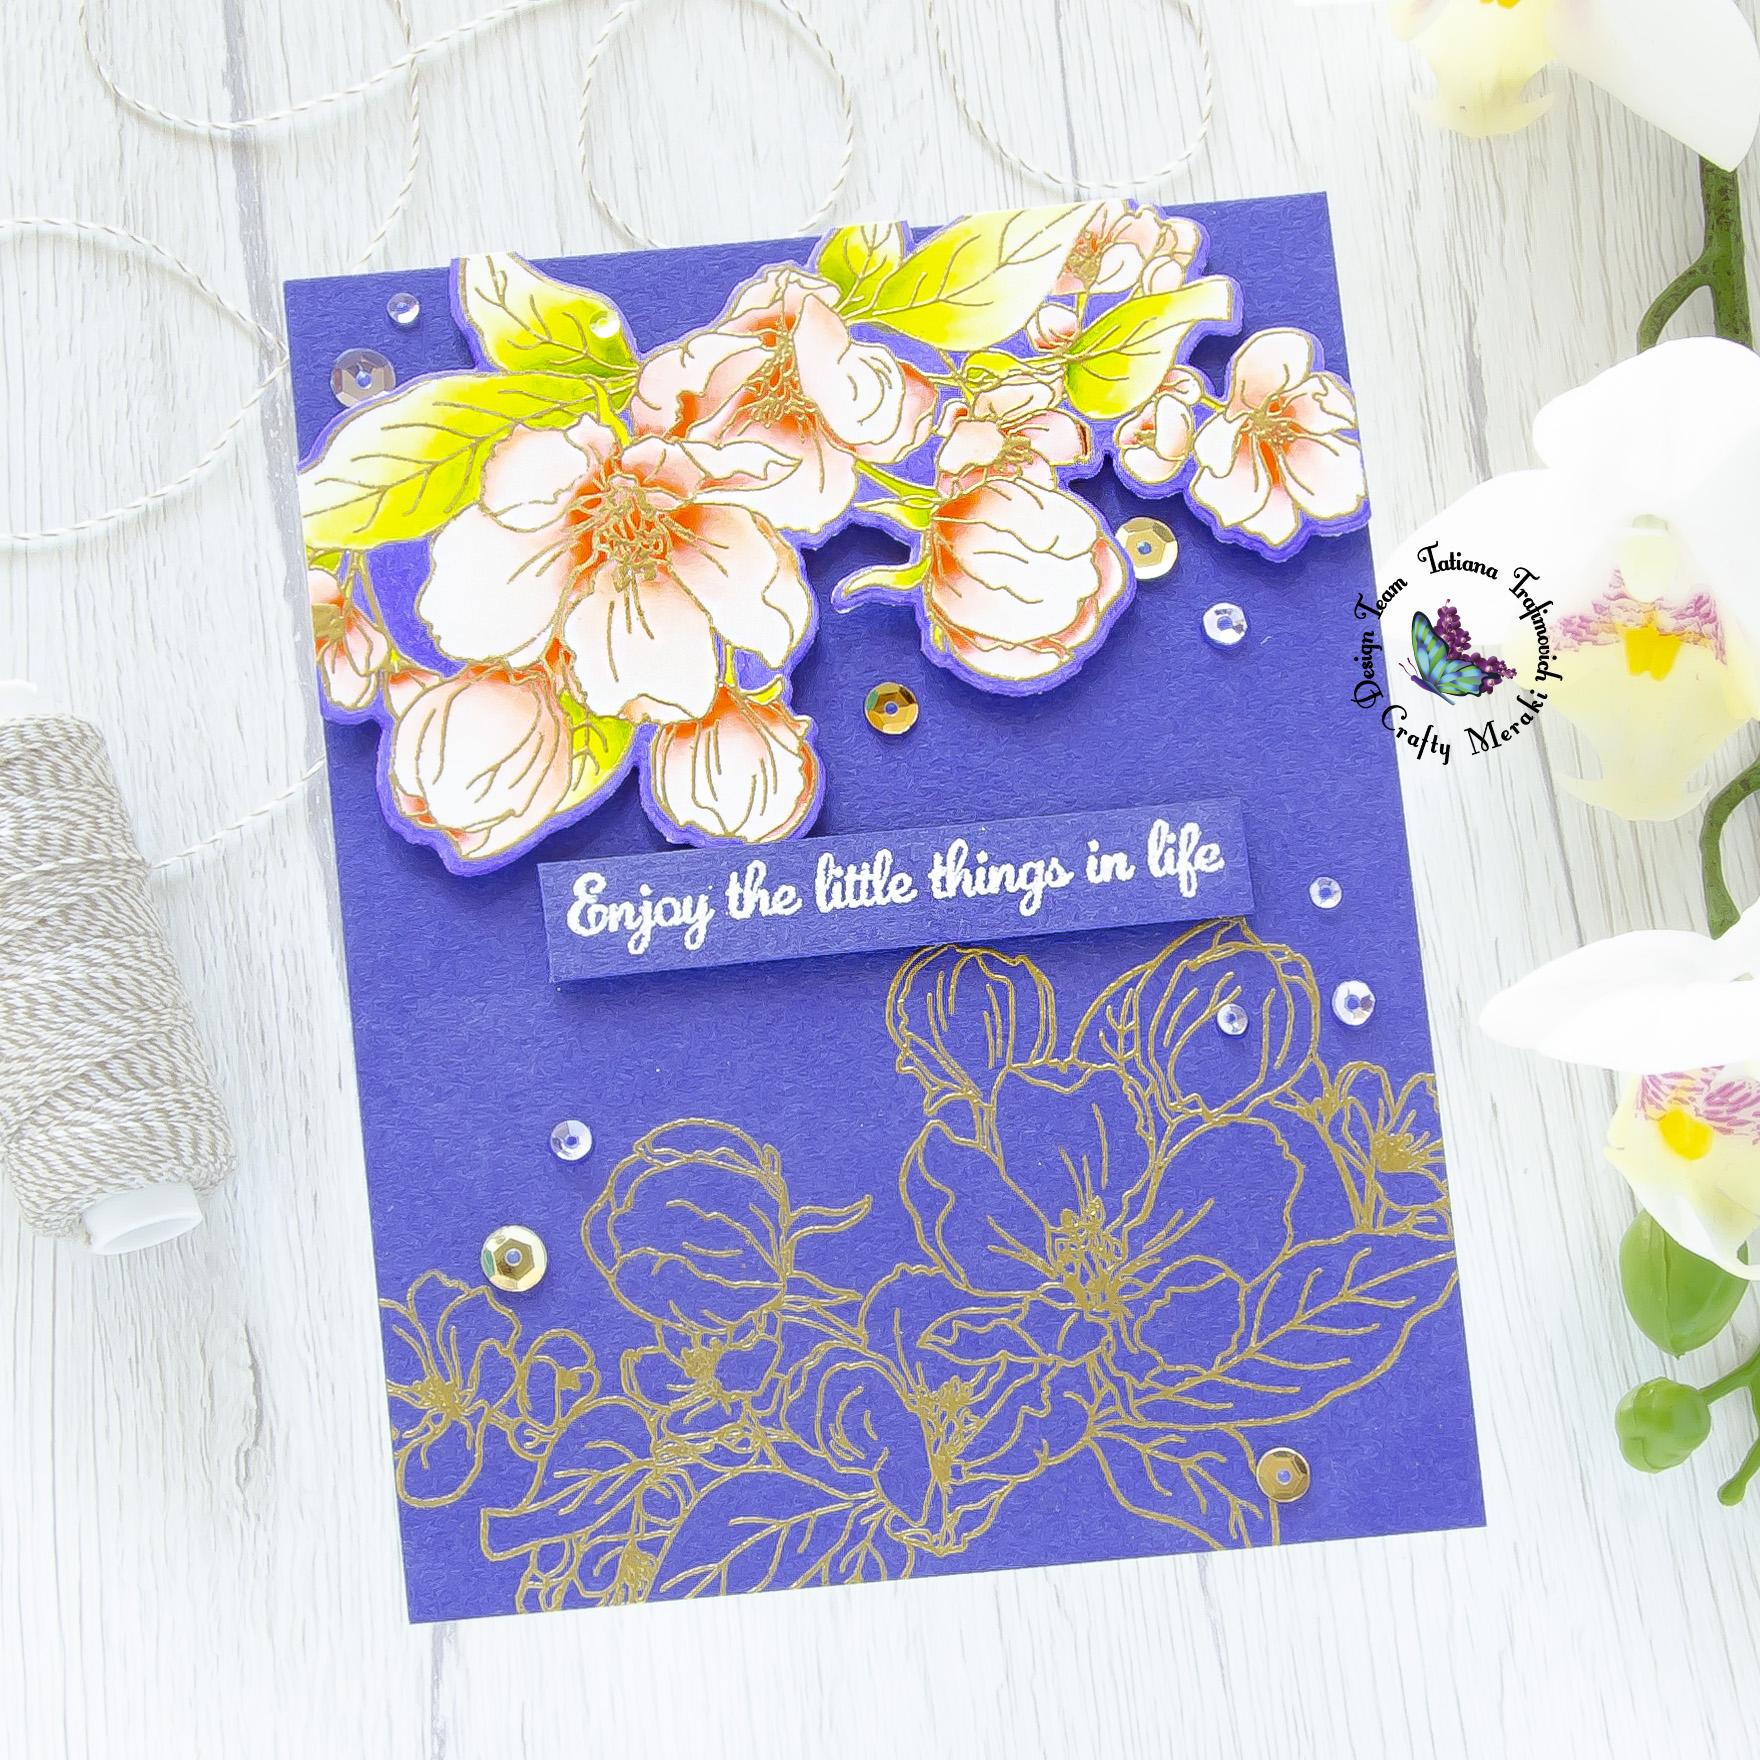 Enjoy The Little Things In Life #handmade card by Tatiana Trafimovich #tatianacraftandart - You Inspire Me stamp set by Crafty Meraki #craftymeraki